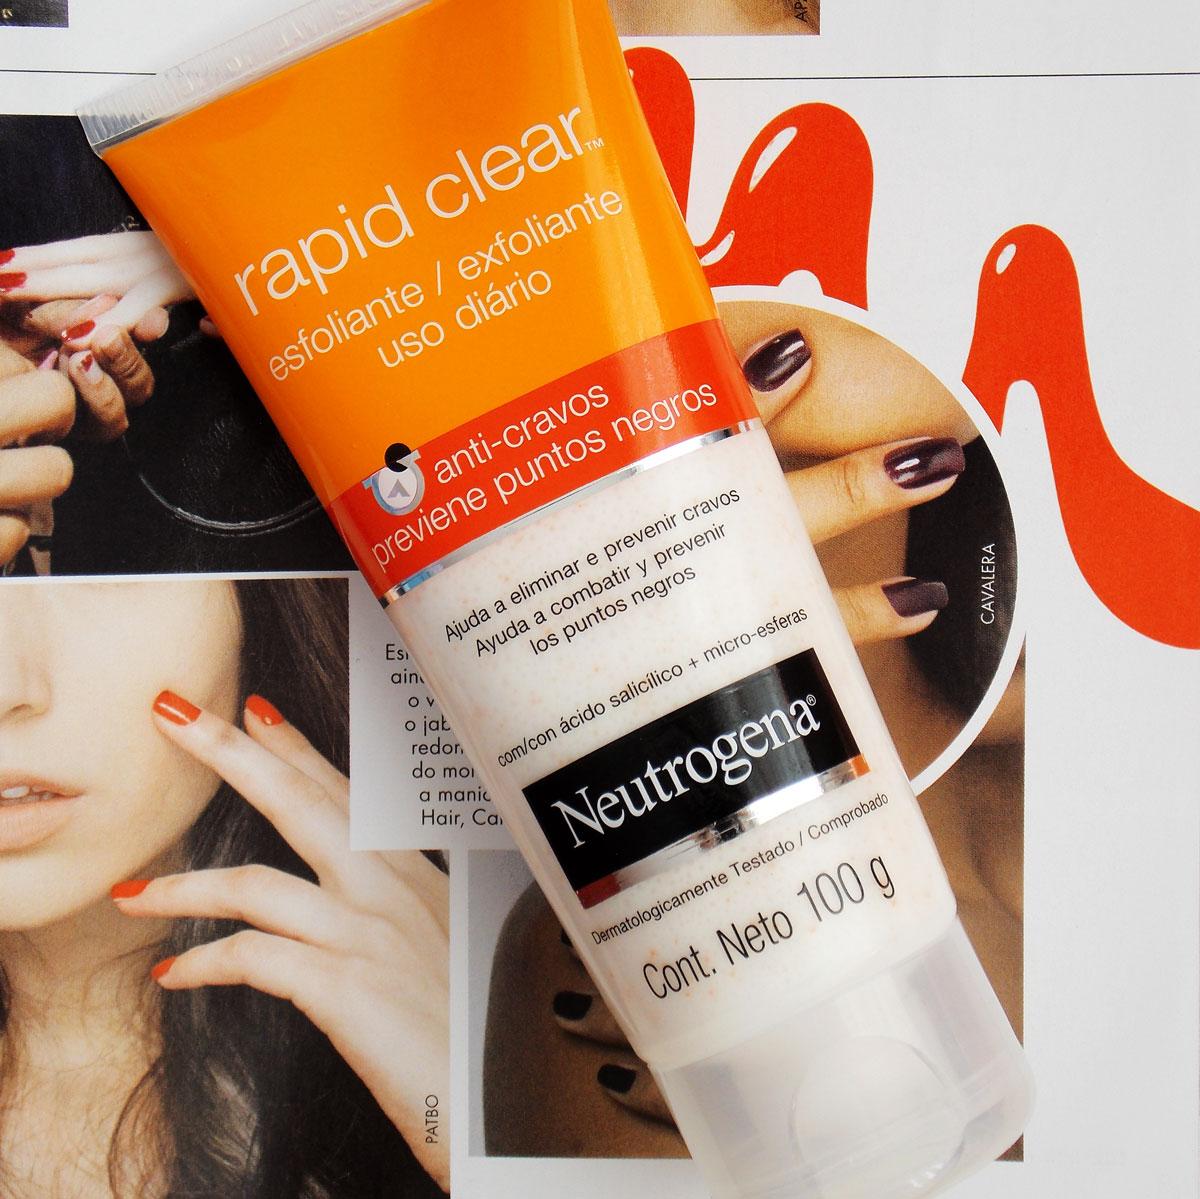 Neutrogena Blackhead Eliminating Daily Scrub Review